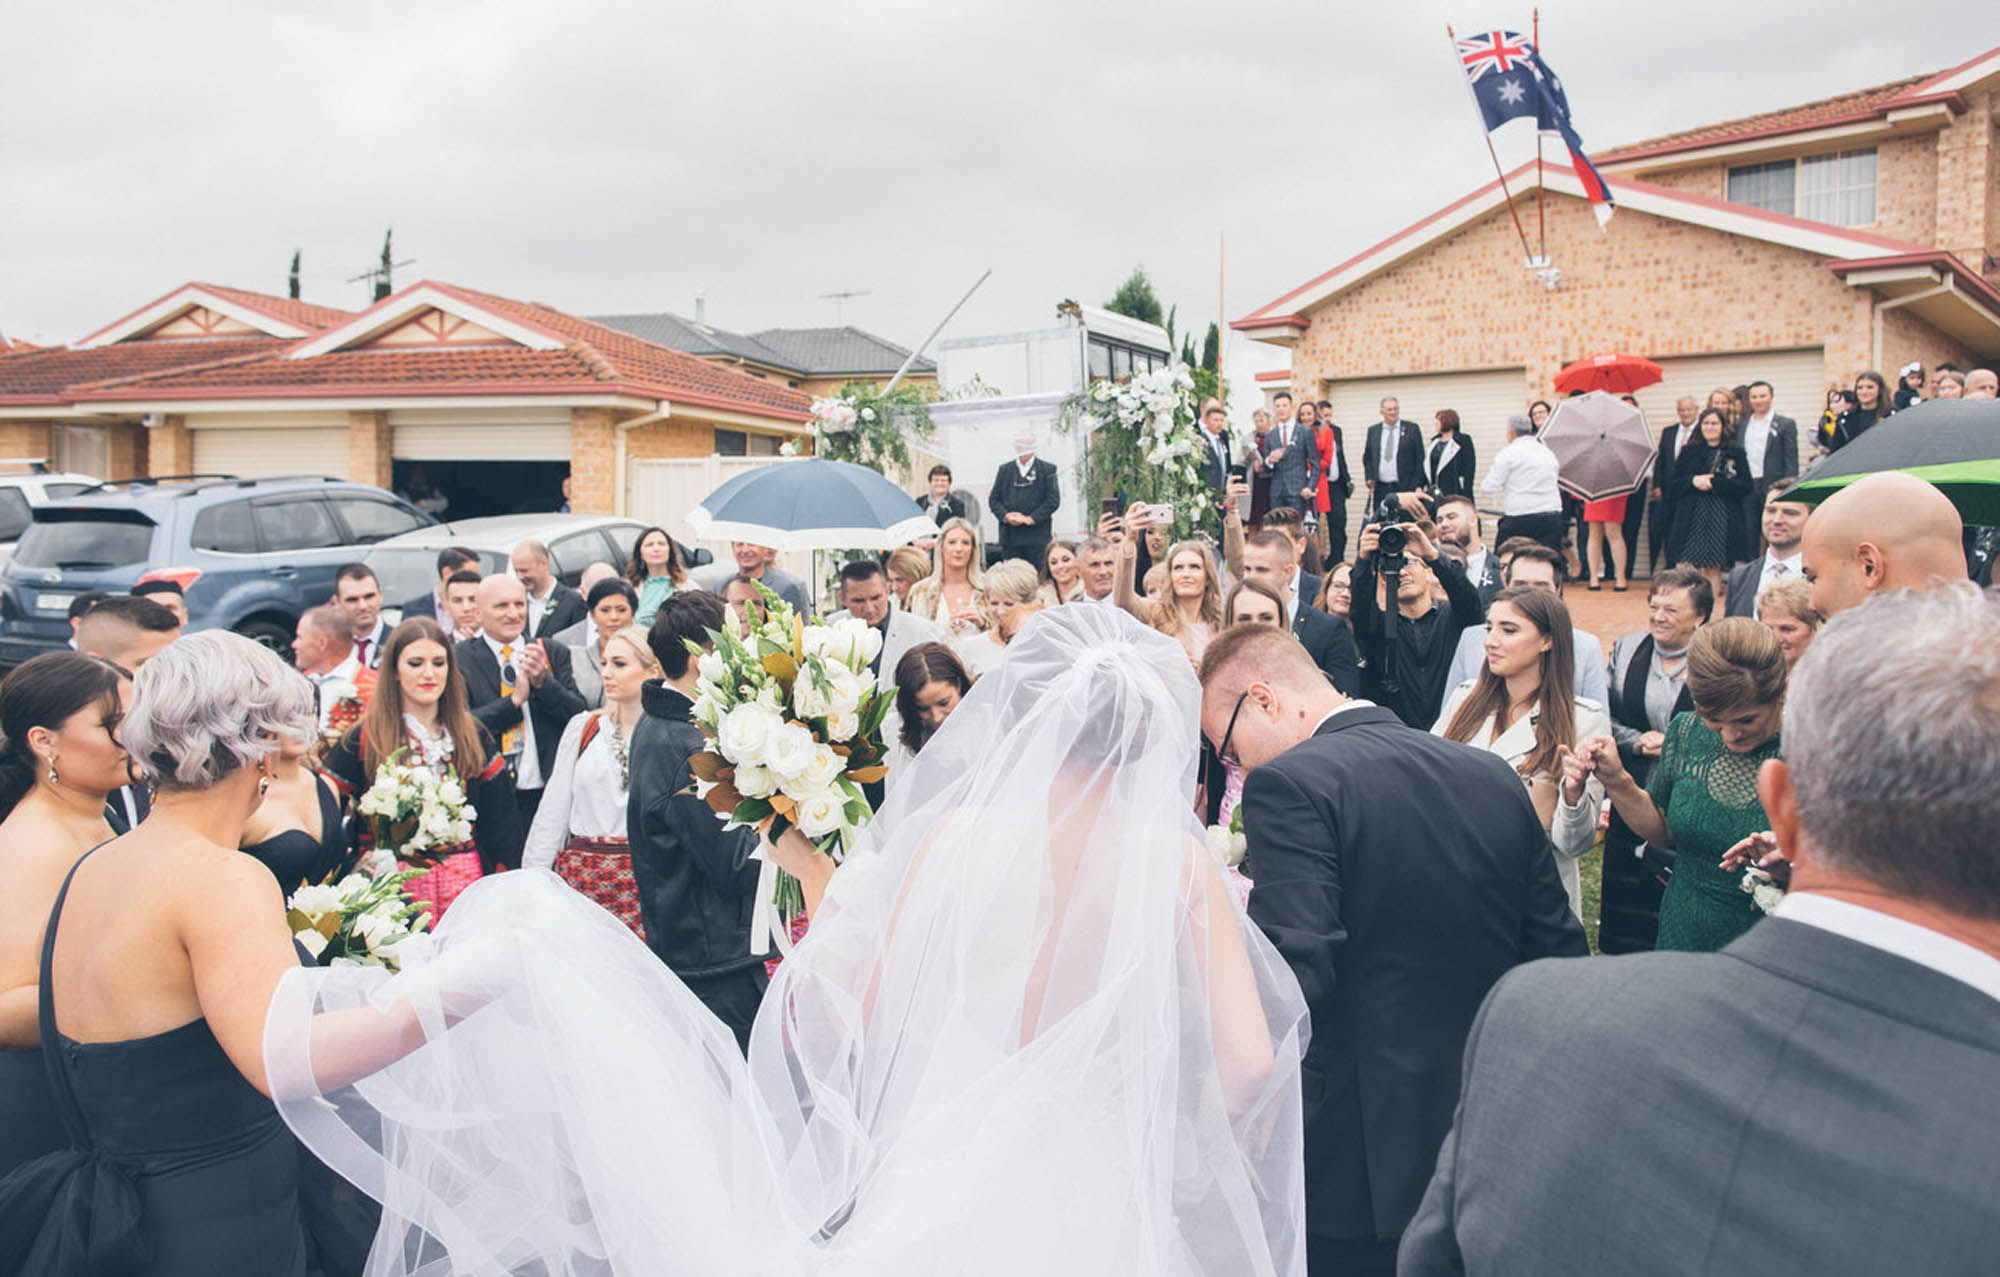 MacDougall-Photography-Sydney-Wedding-Photographers-17.jpg